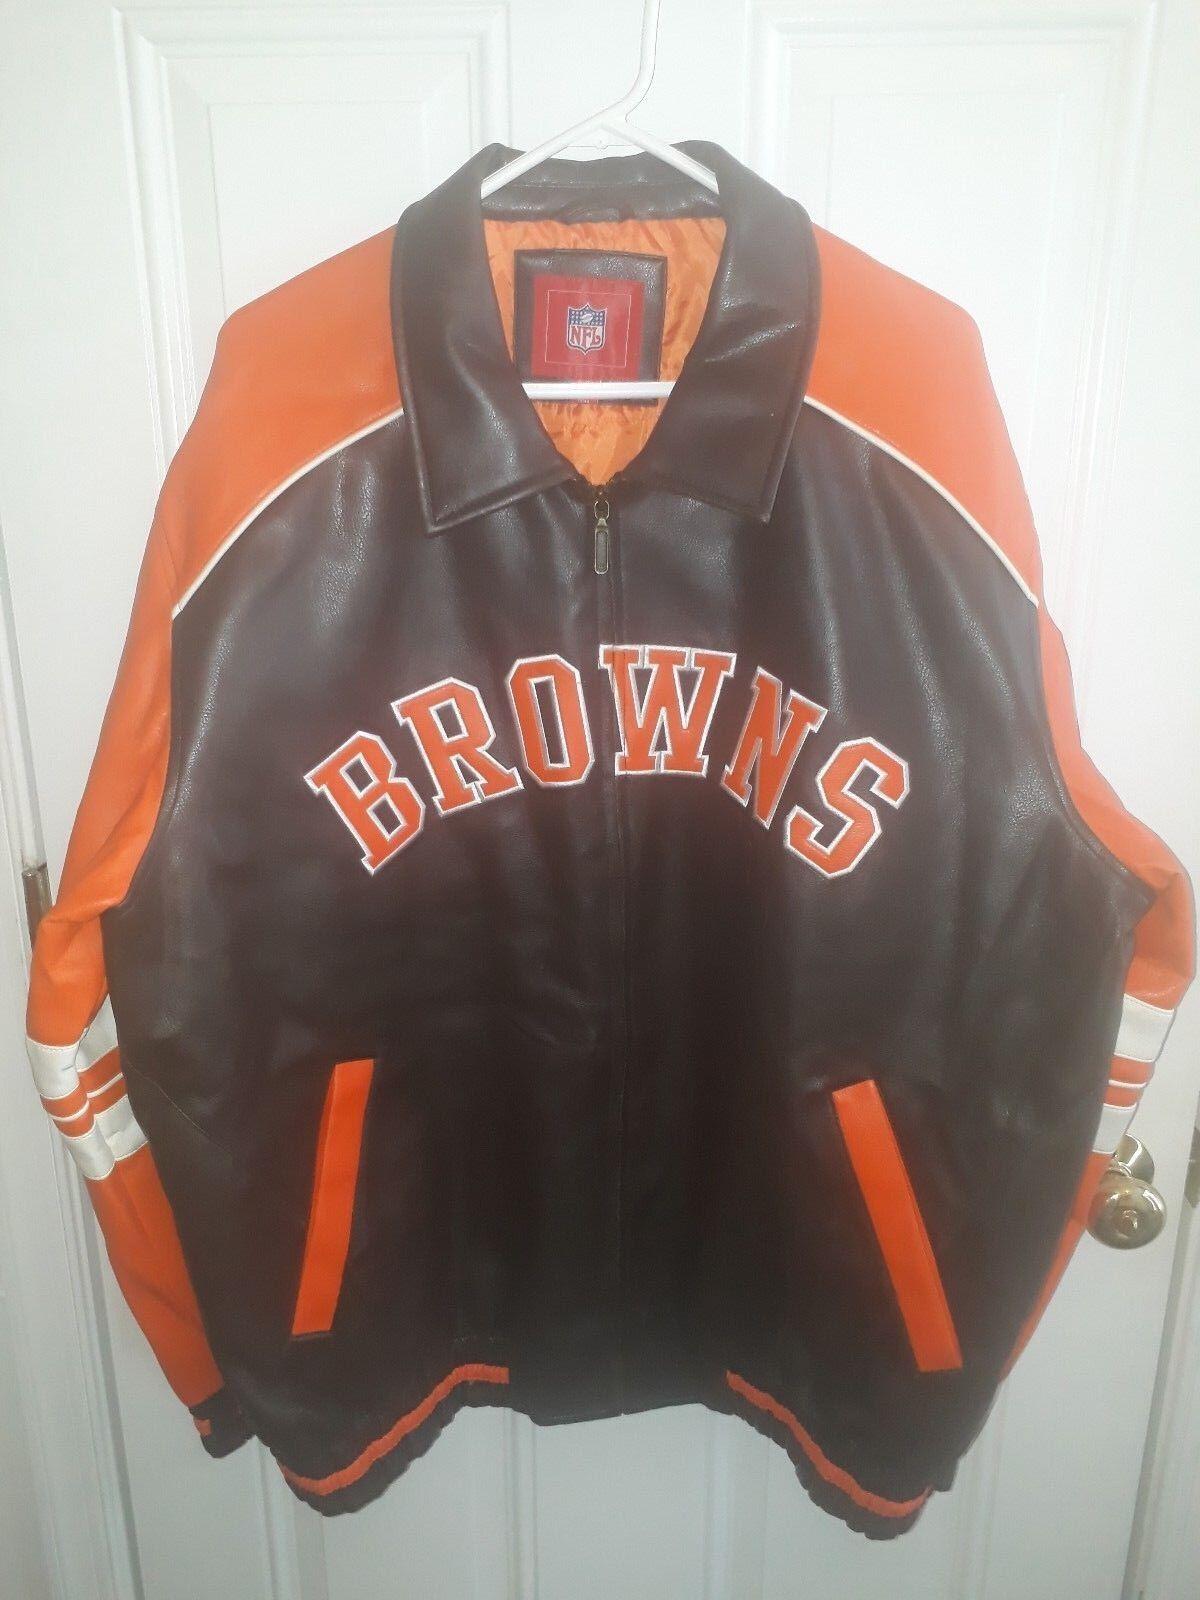 CLEVELAND braunS Leatherette Jacket Coat NFL